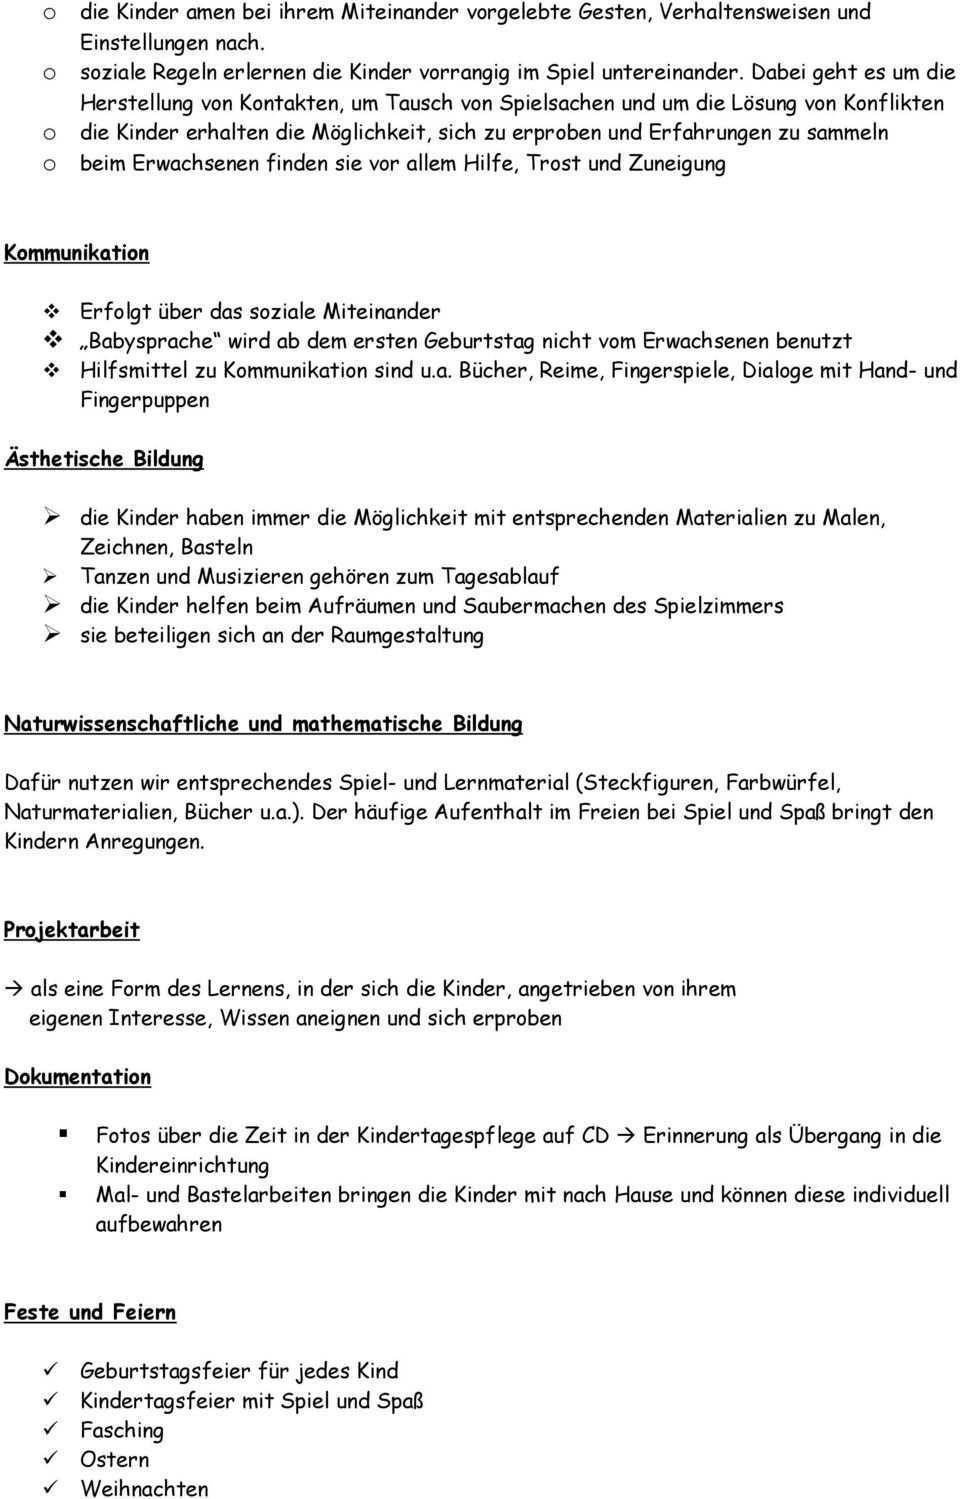 Konzeption Kindertagespflege Uta Neubauer Pdf Kostenfreier Download